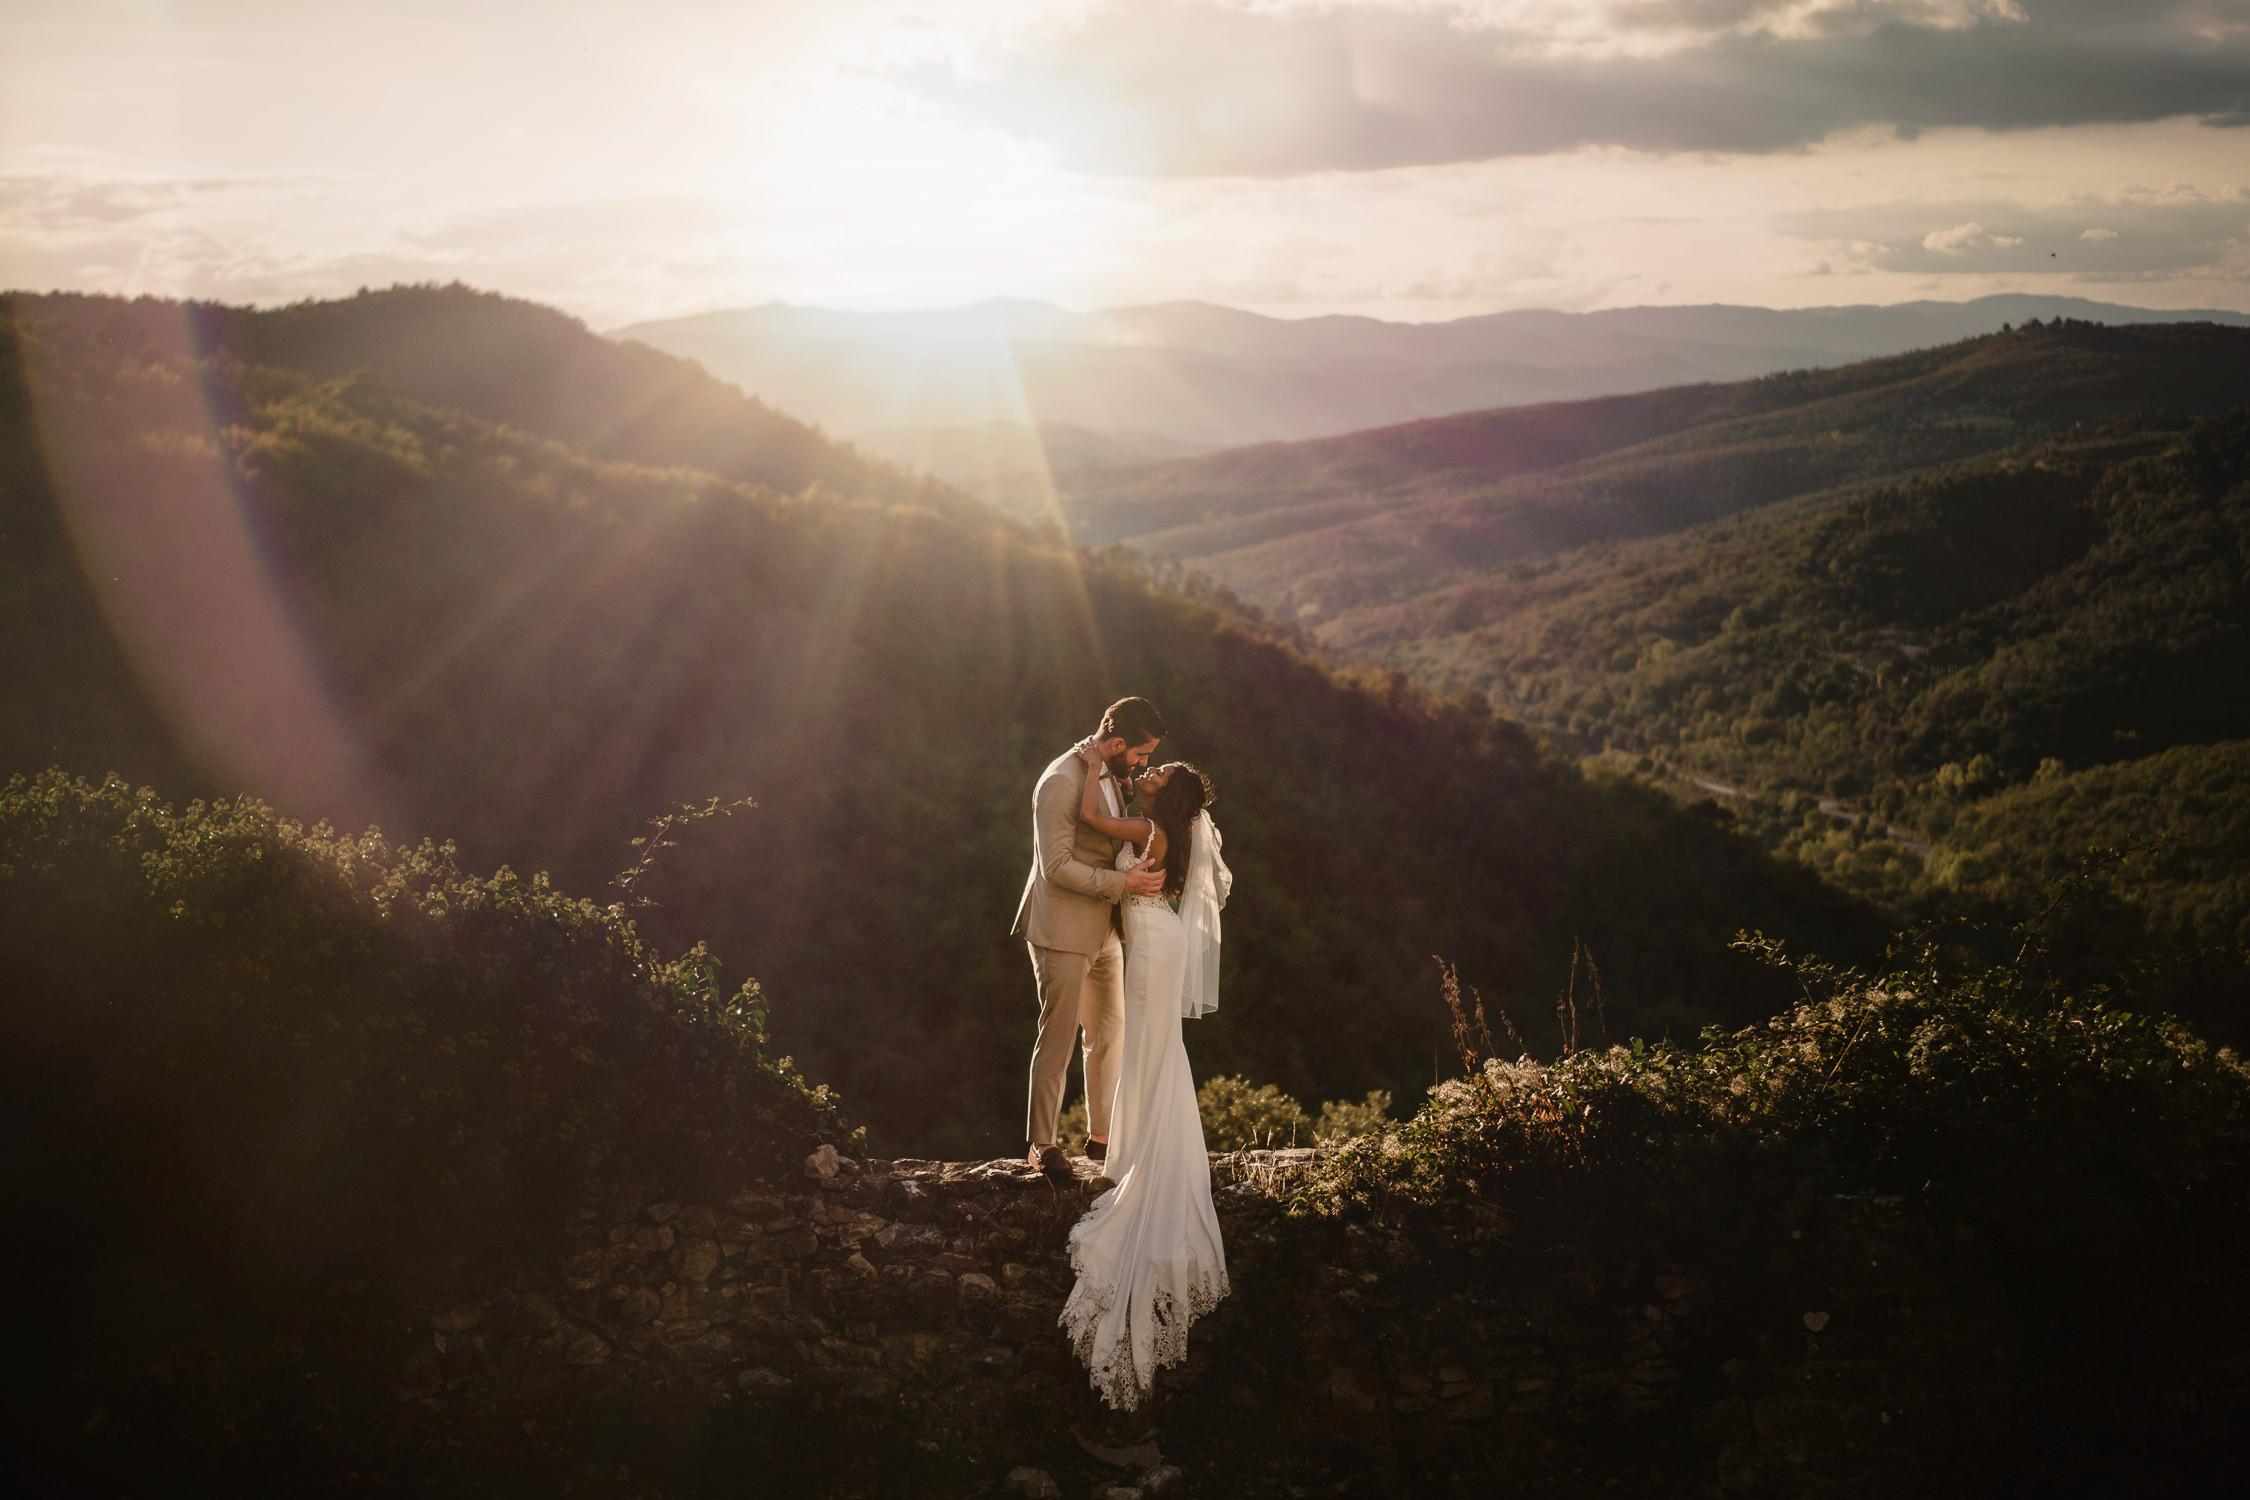 best destination wedding photographer netherlands mark hadden couple on landscape